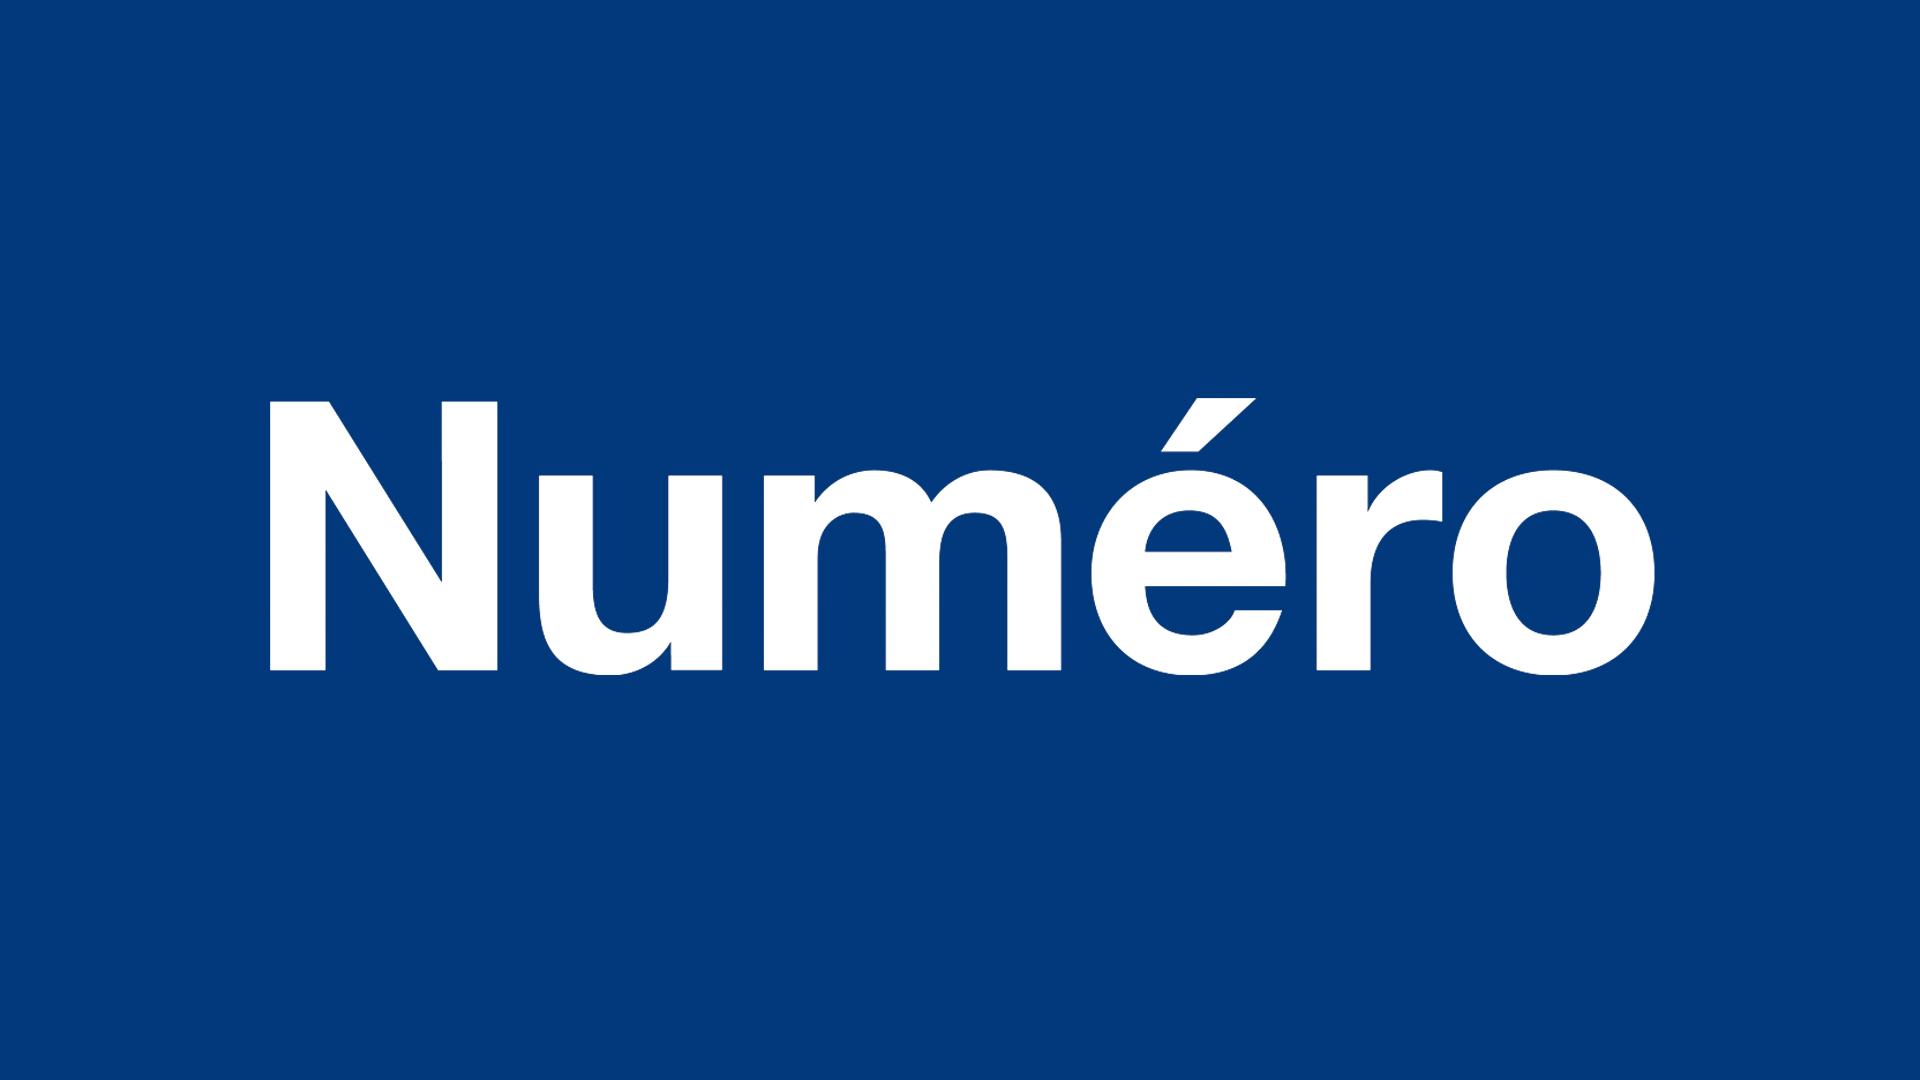 16 - Numero_FR_dec2016-jan2017.jpg